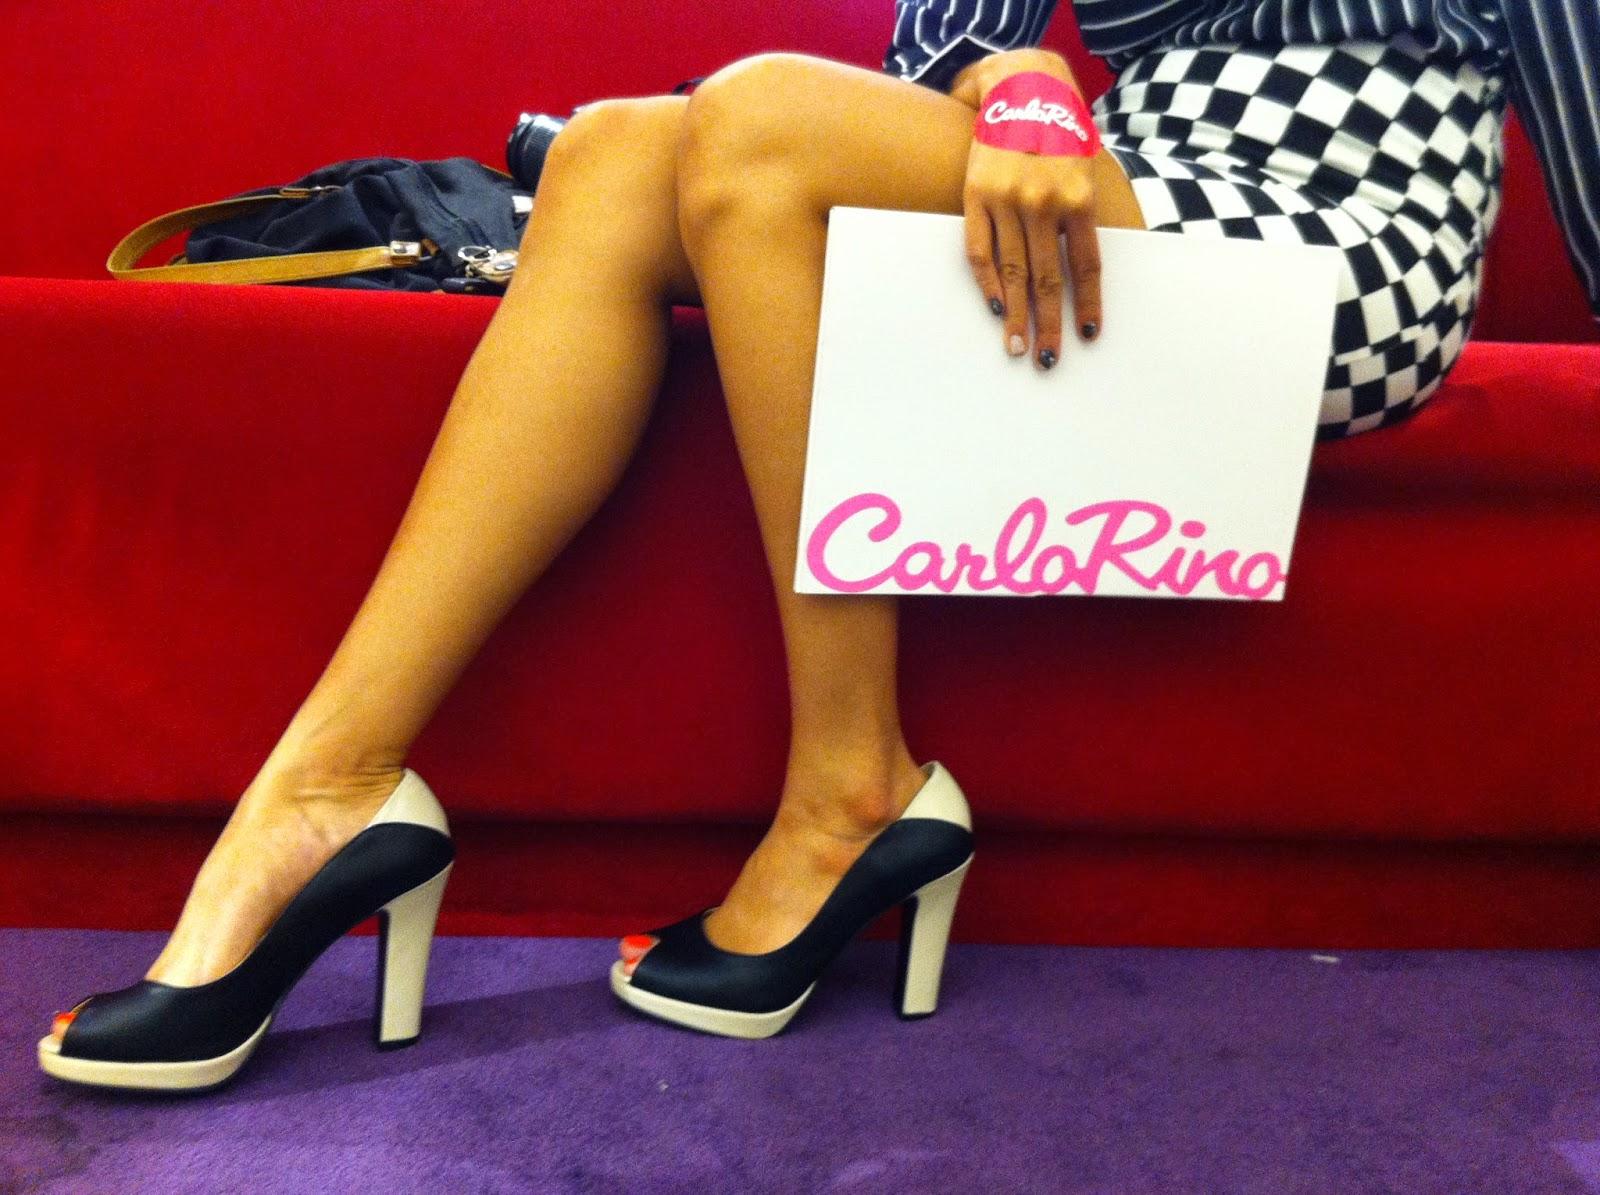 85a0ddfaede0 Your Shopping Kaki - A Review Blog  Carlo Rino Event  Spring into ...